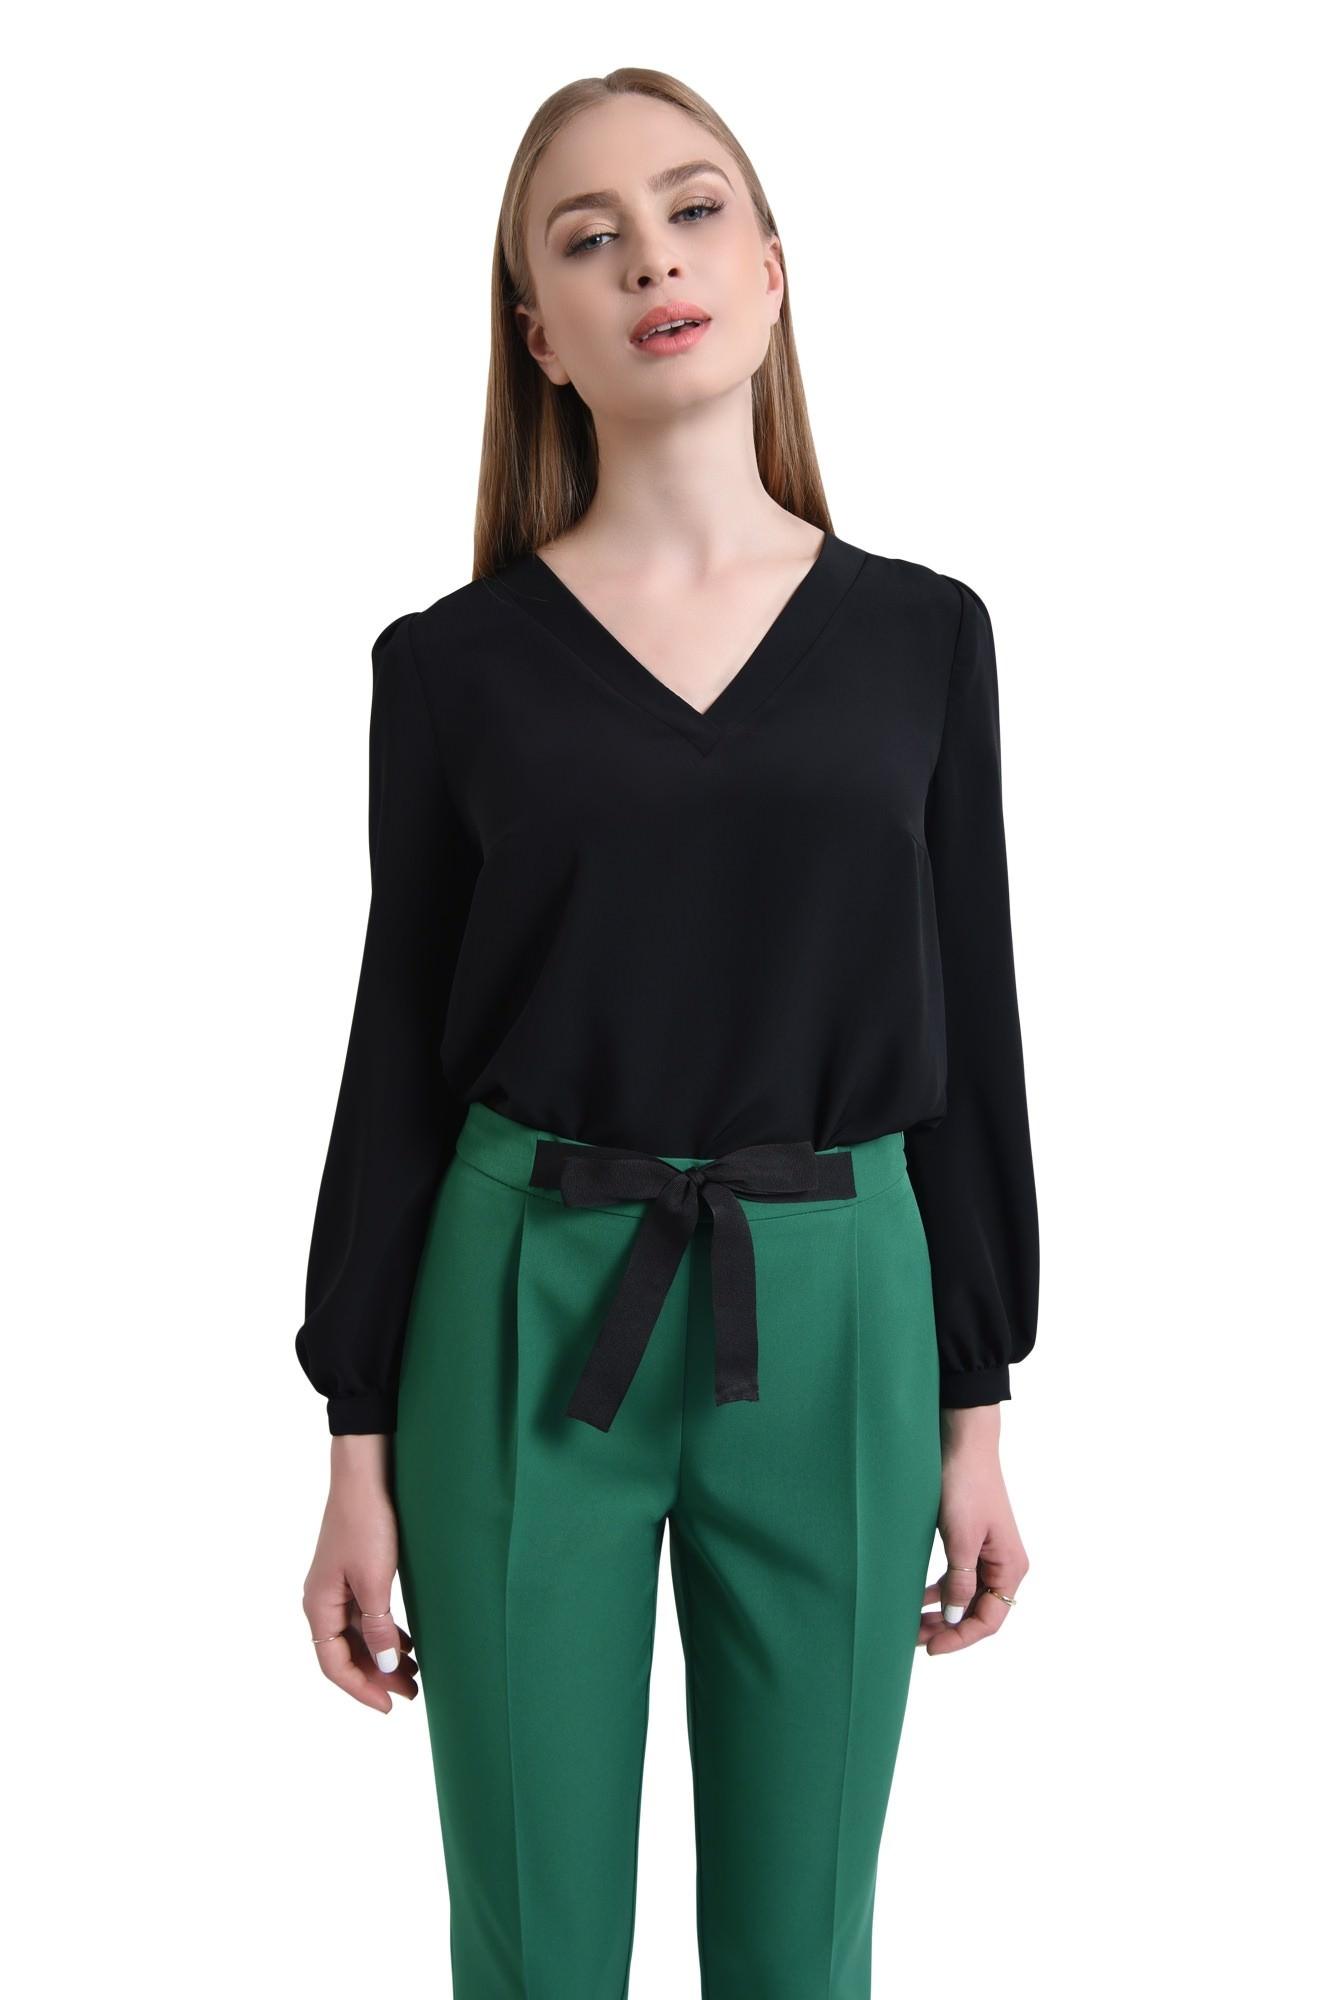 0 - Pantaloni casual, verde